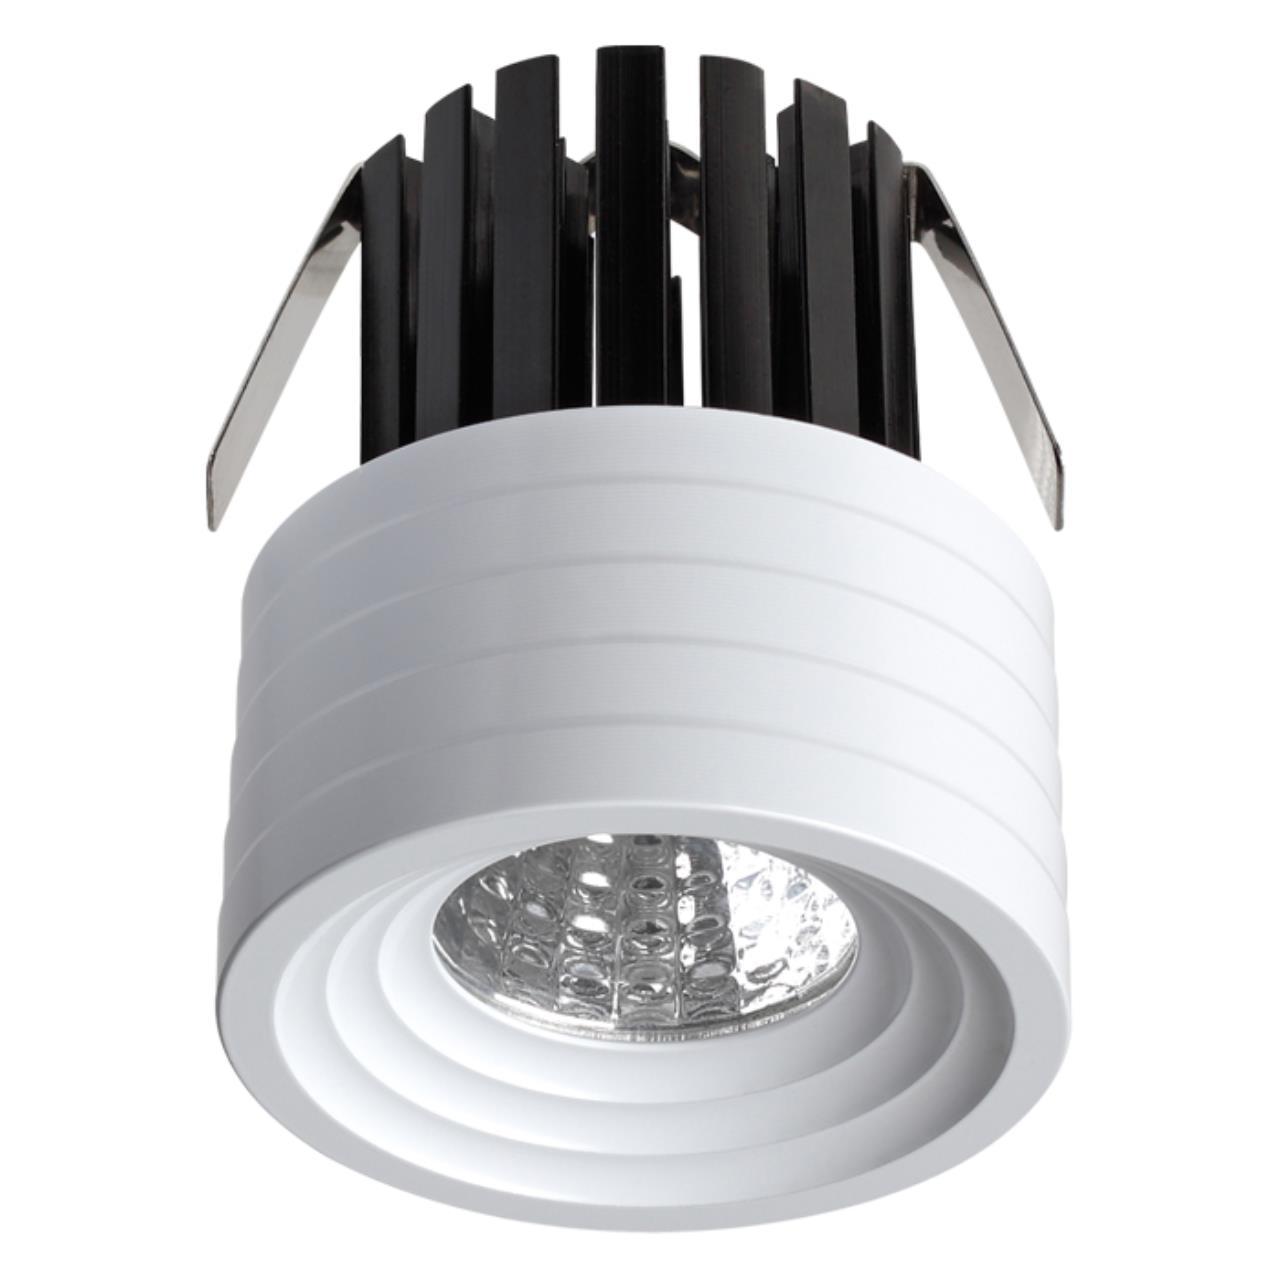 357699 SPOT NT18 090 белый Встраиваемый светильник IP20 LED 3000K 3W 160-265V DOT